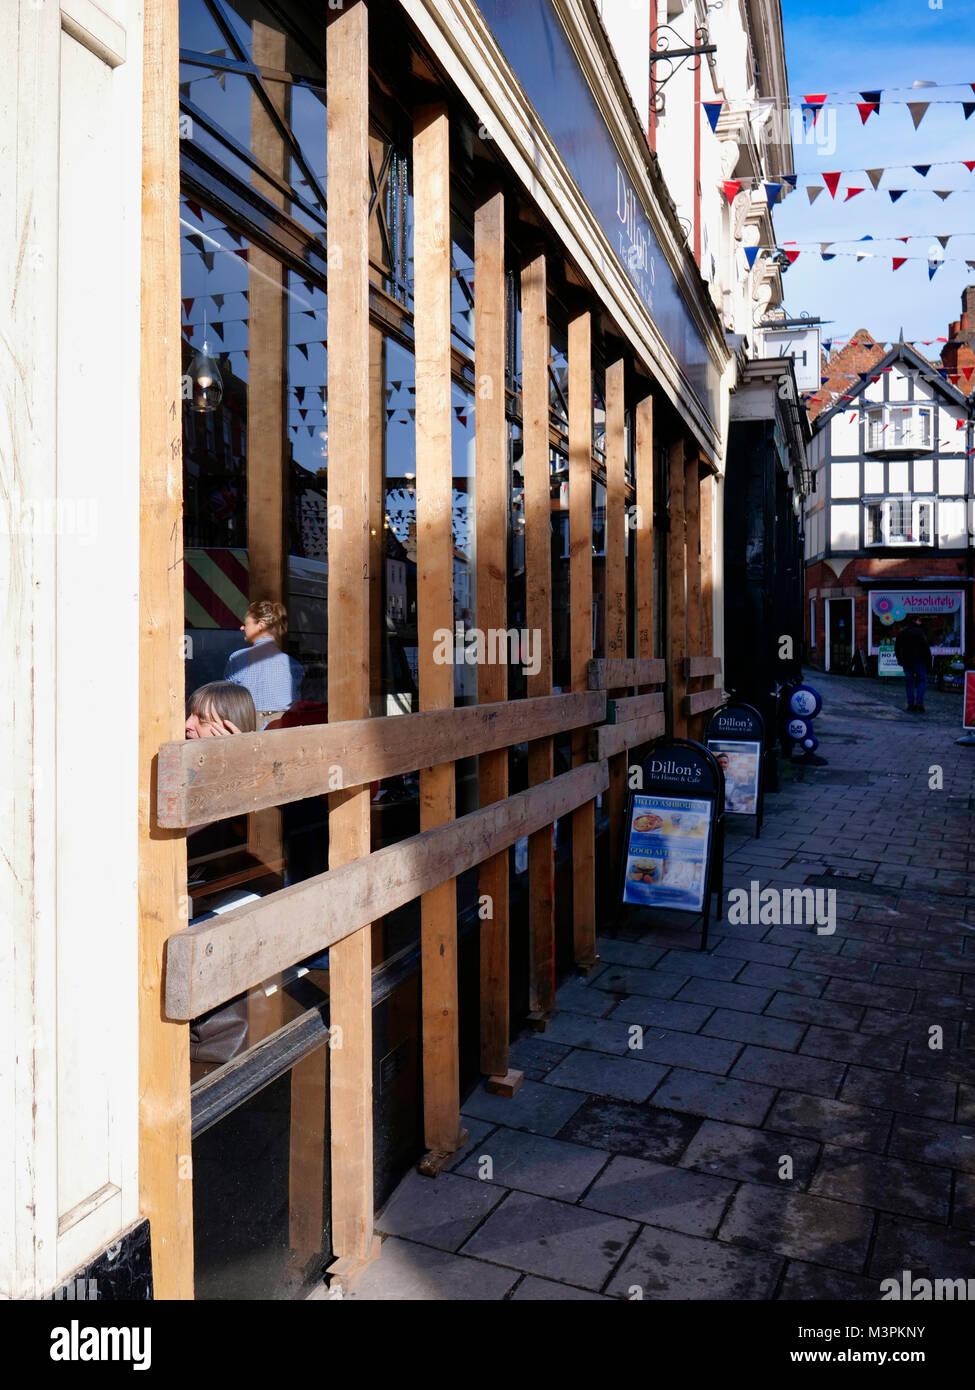 All boarded up. Ashbourne town centre shop windows are boarded up for the start for the Ashbourne Royal Shrovetide - Stock Image